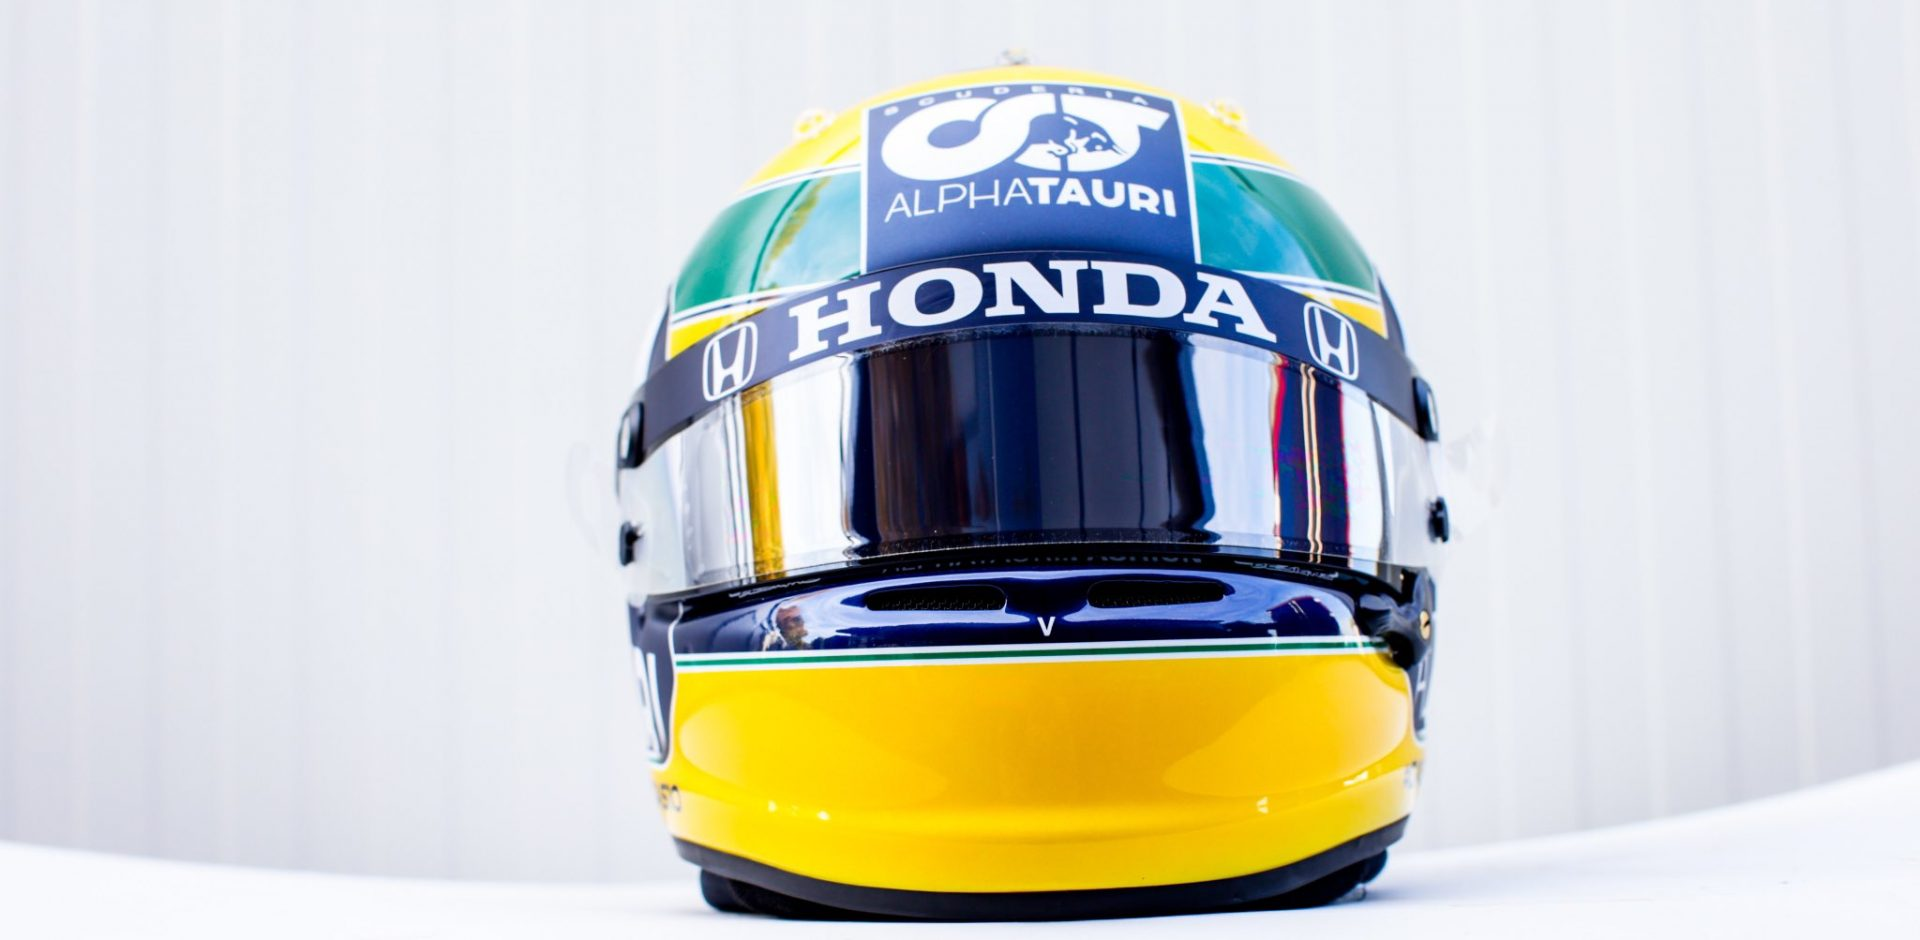 Pierre Gasly's helmet to tribute Ayrton Senna in Imola, 2020 Emilia Romagna Grand Prix, AlphaTauri